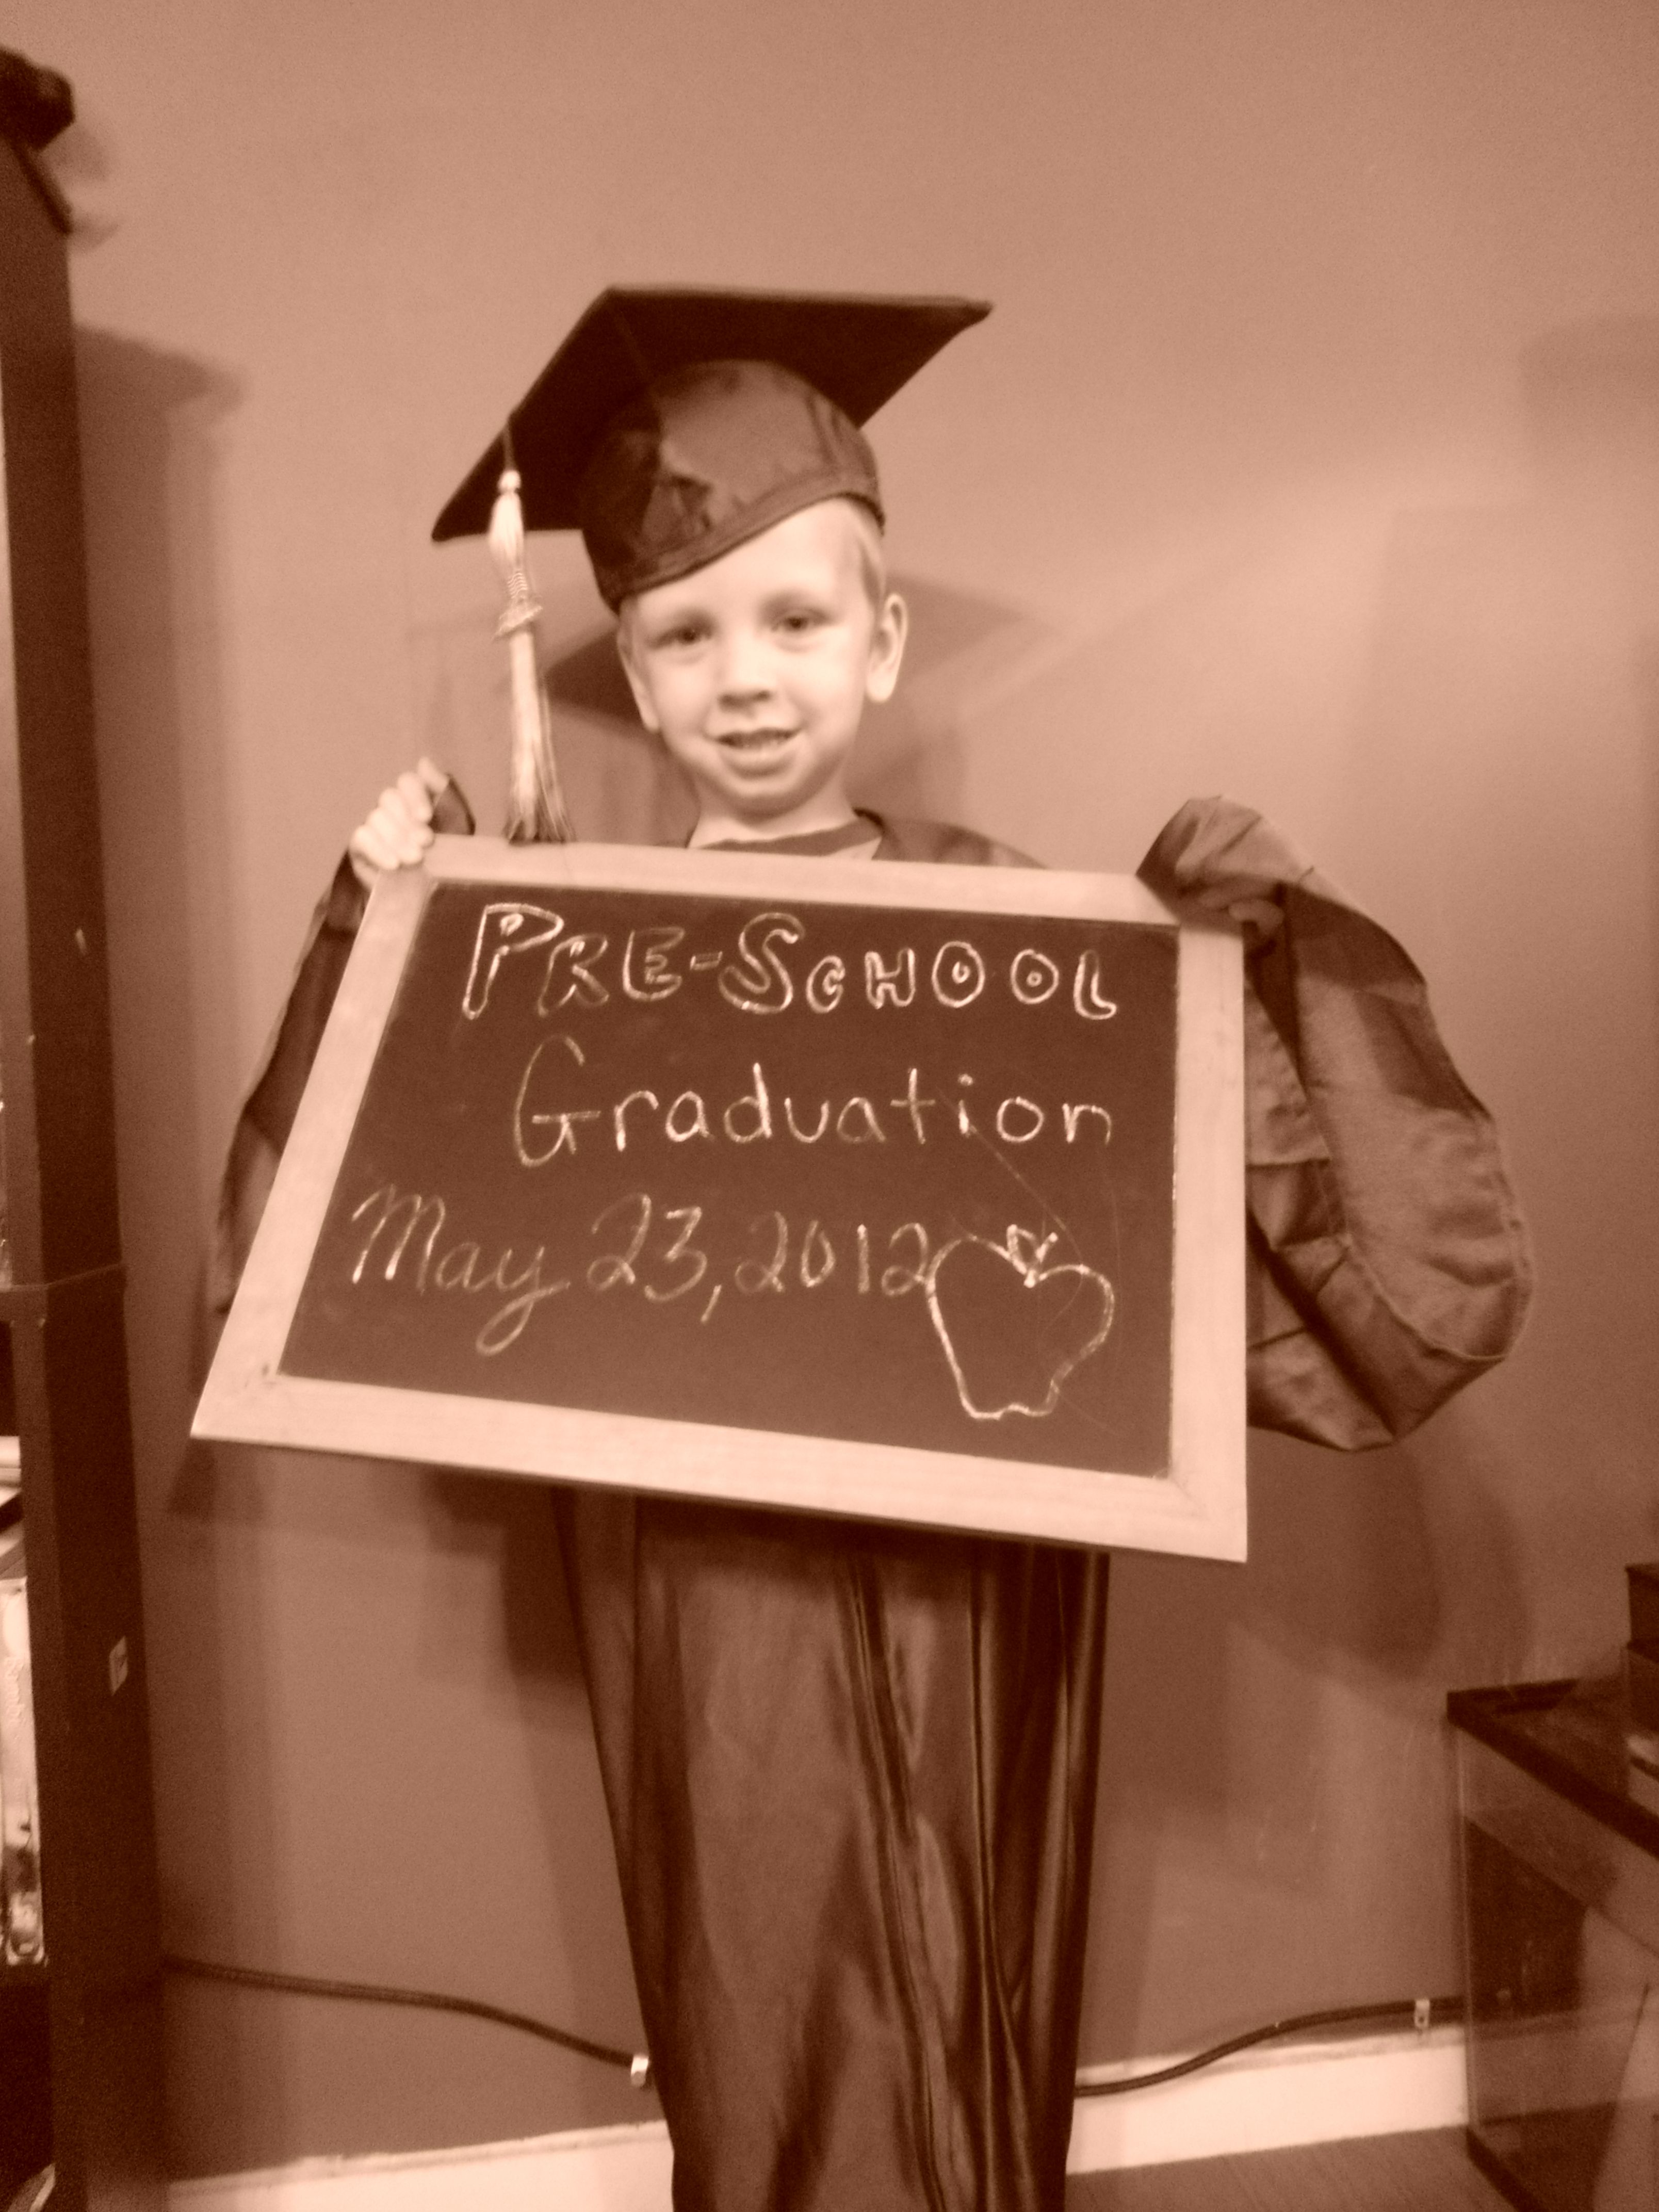 take his preschool graduation picture in my high school graduation ...